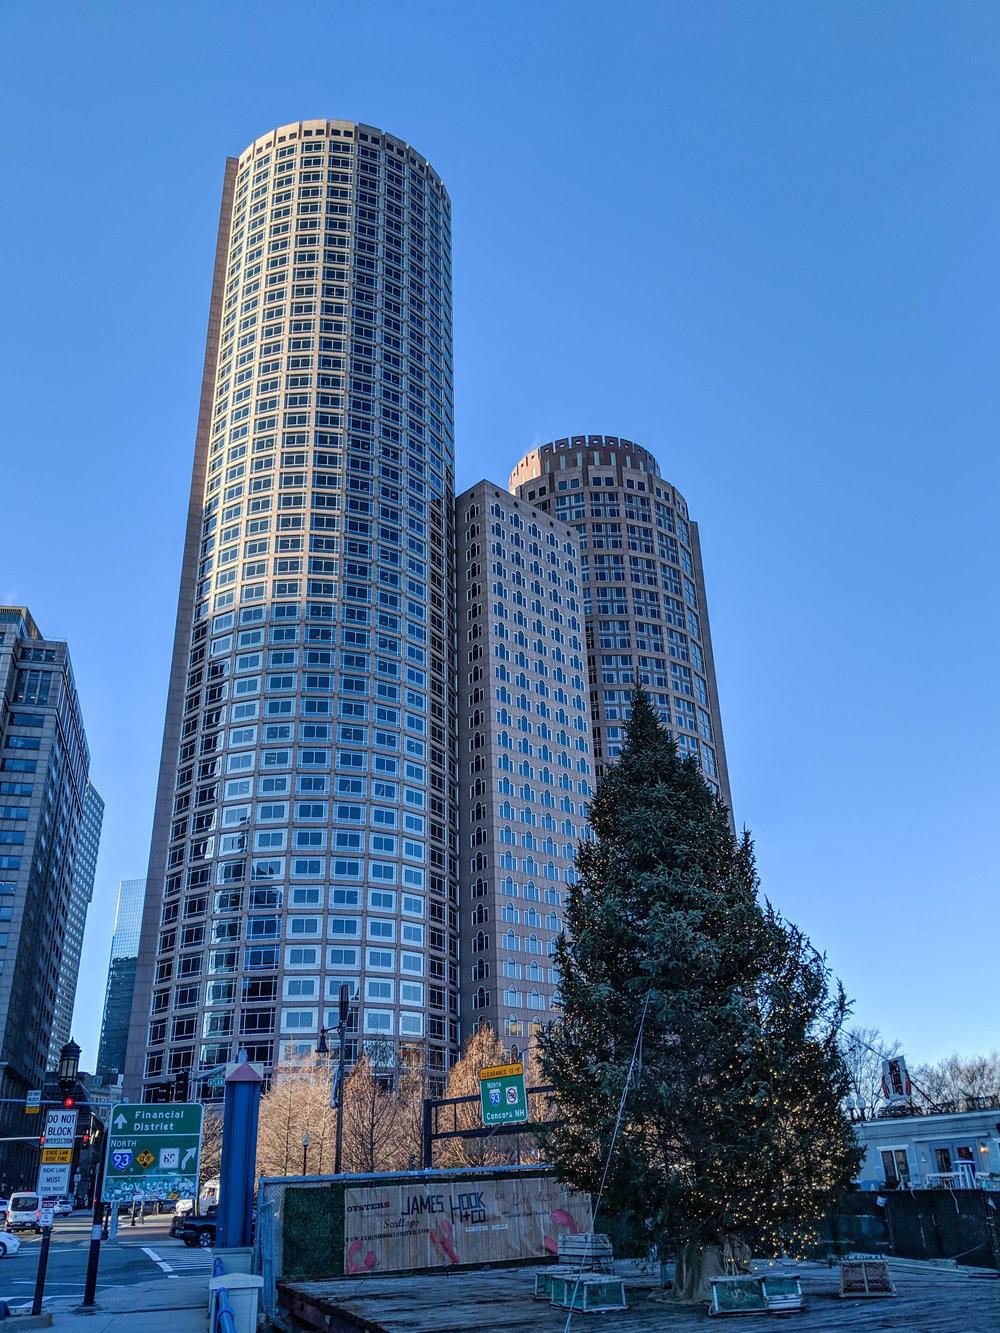 bri rinehart; photography; boston; Christmas